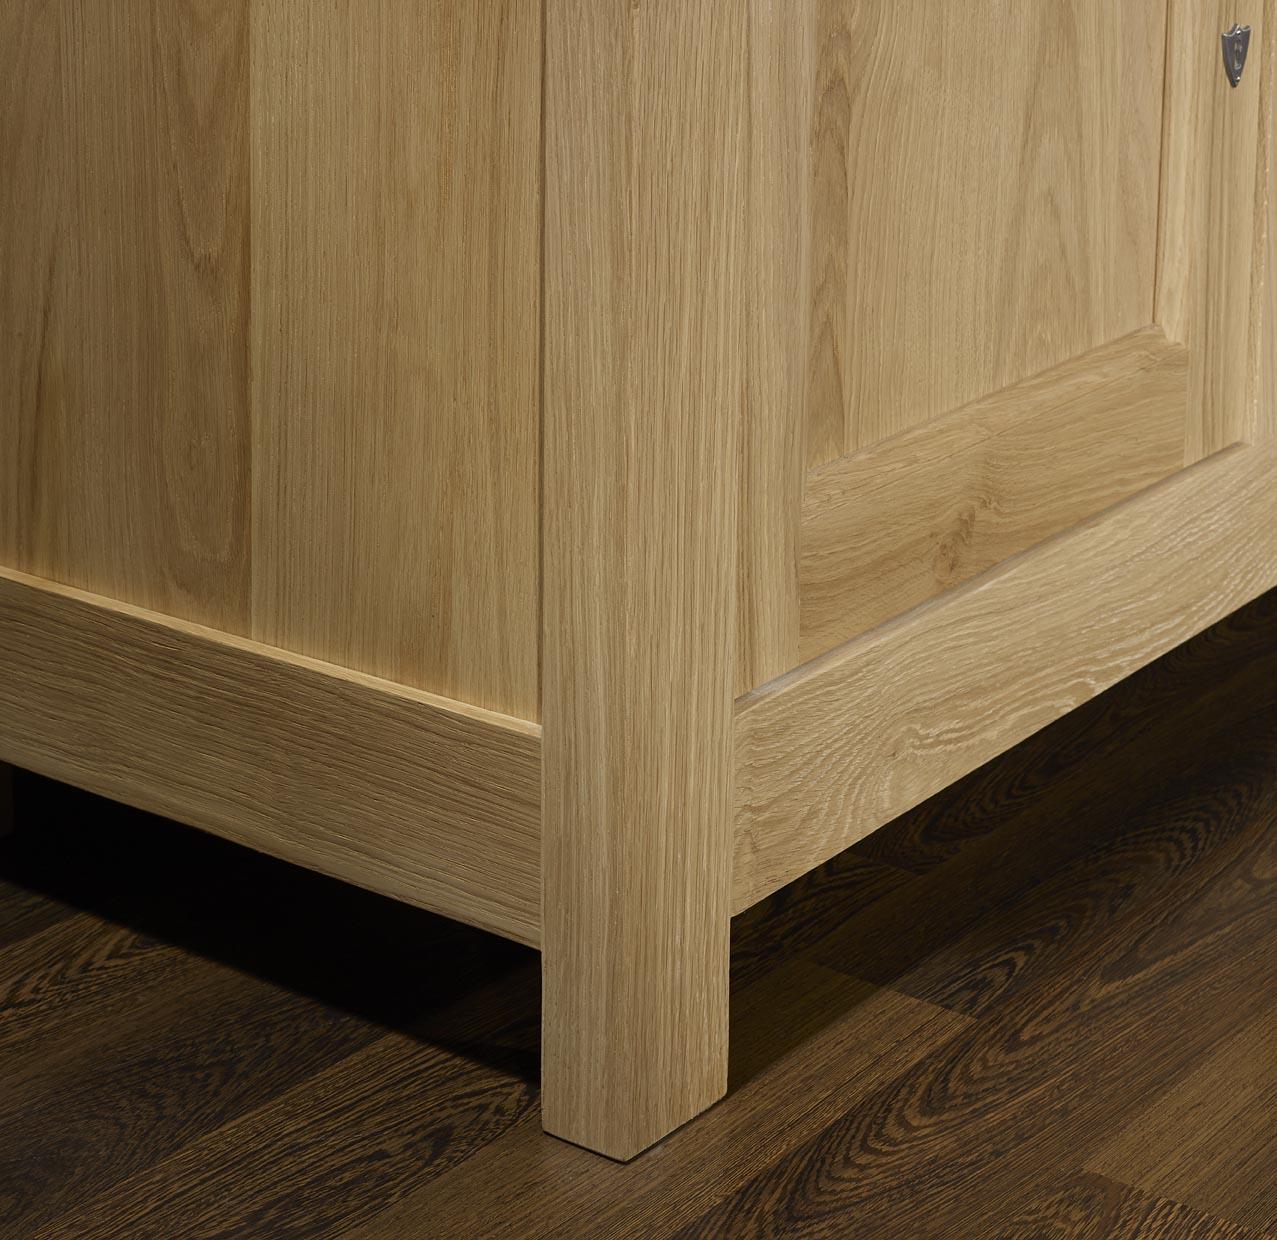 meuble tv 16 9eme amaury en ch ne massif de style. Black Bedroom Furniture Sets. Home Design Ideas